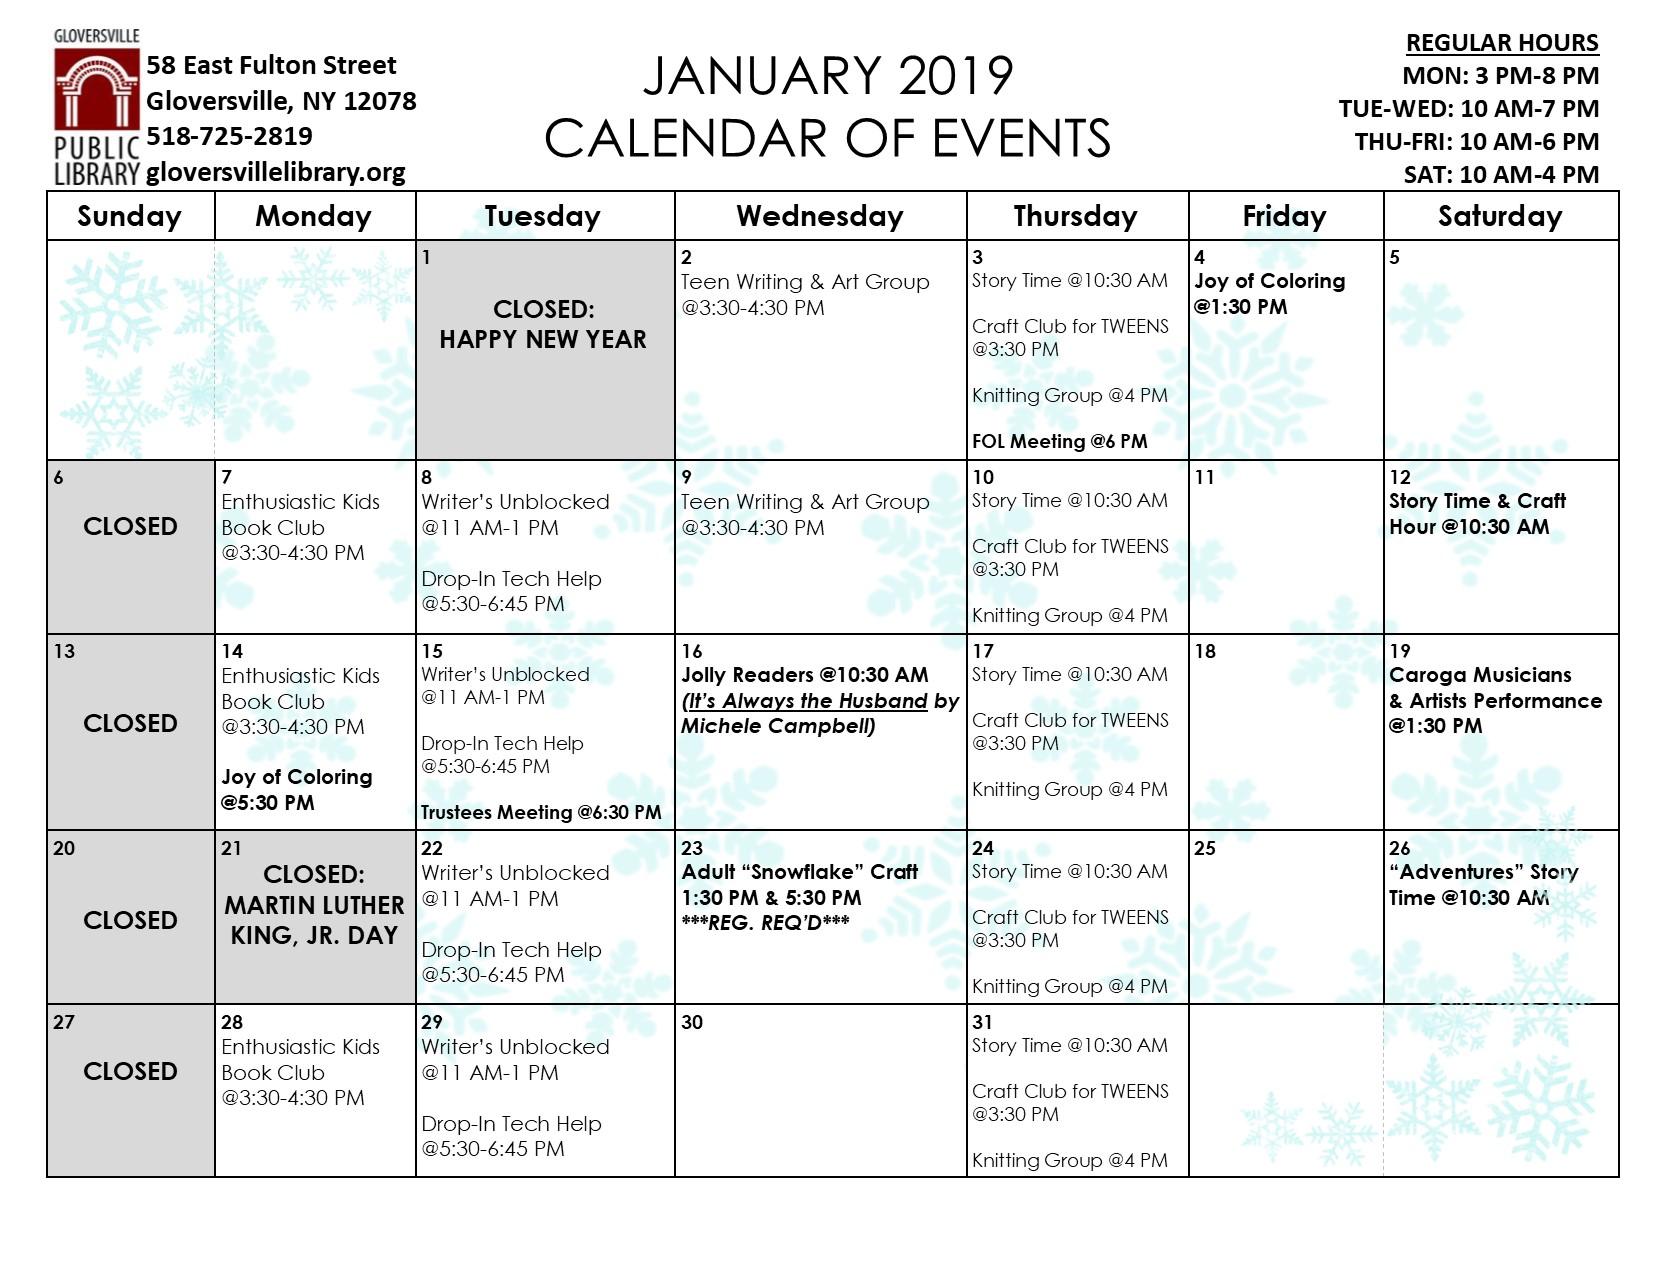 Click on the above calendar for a printable version as well as program descriptions.